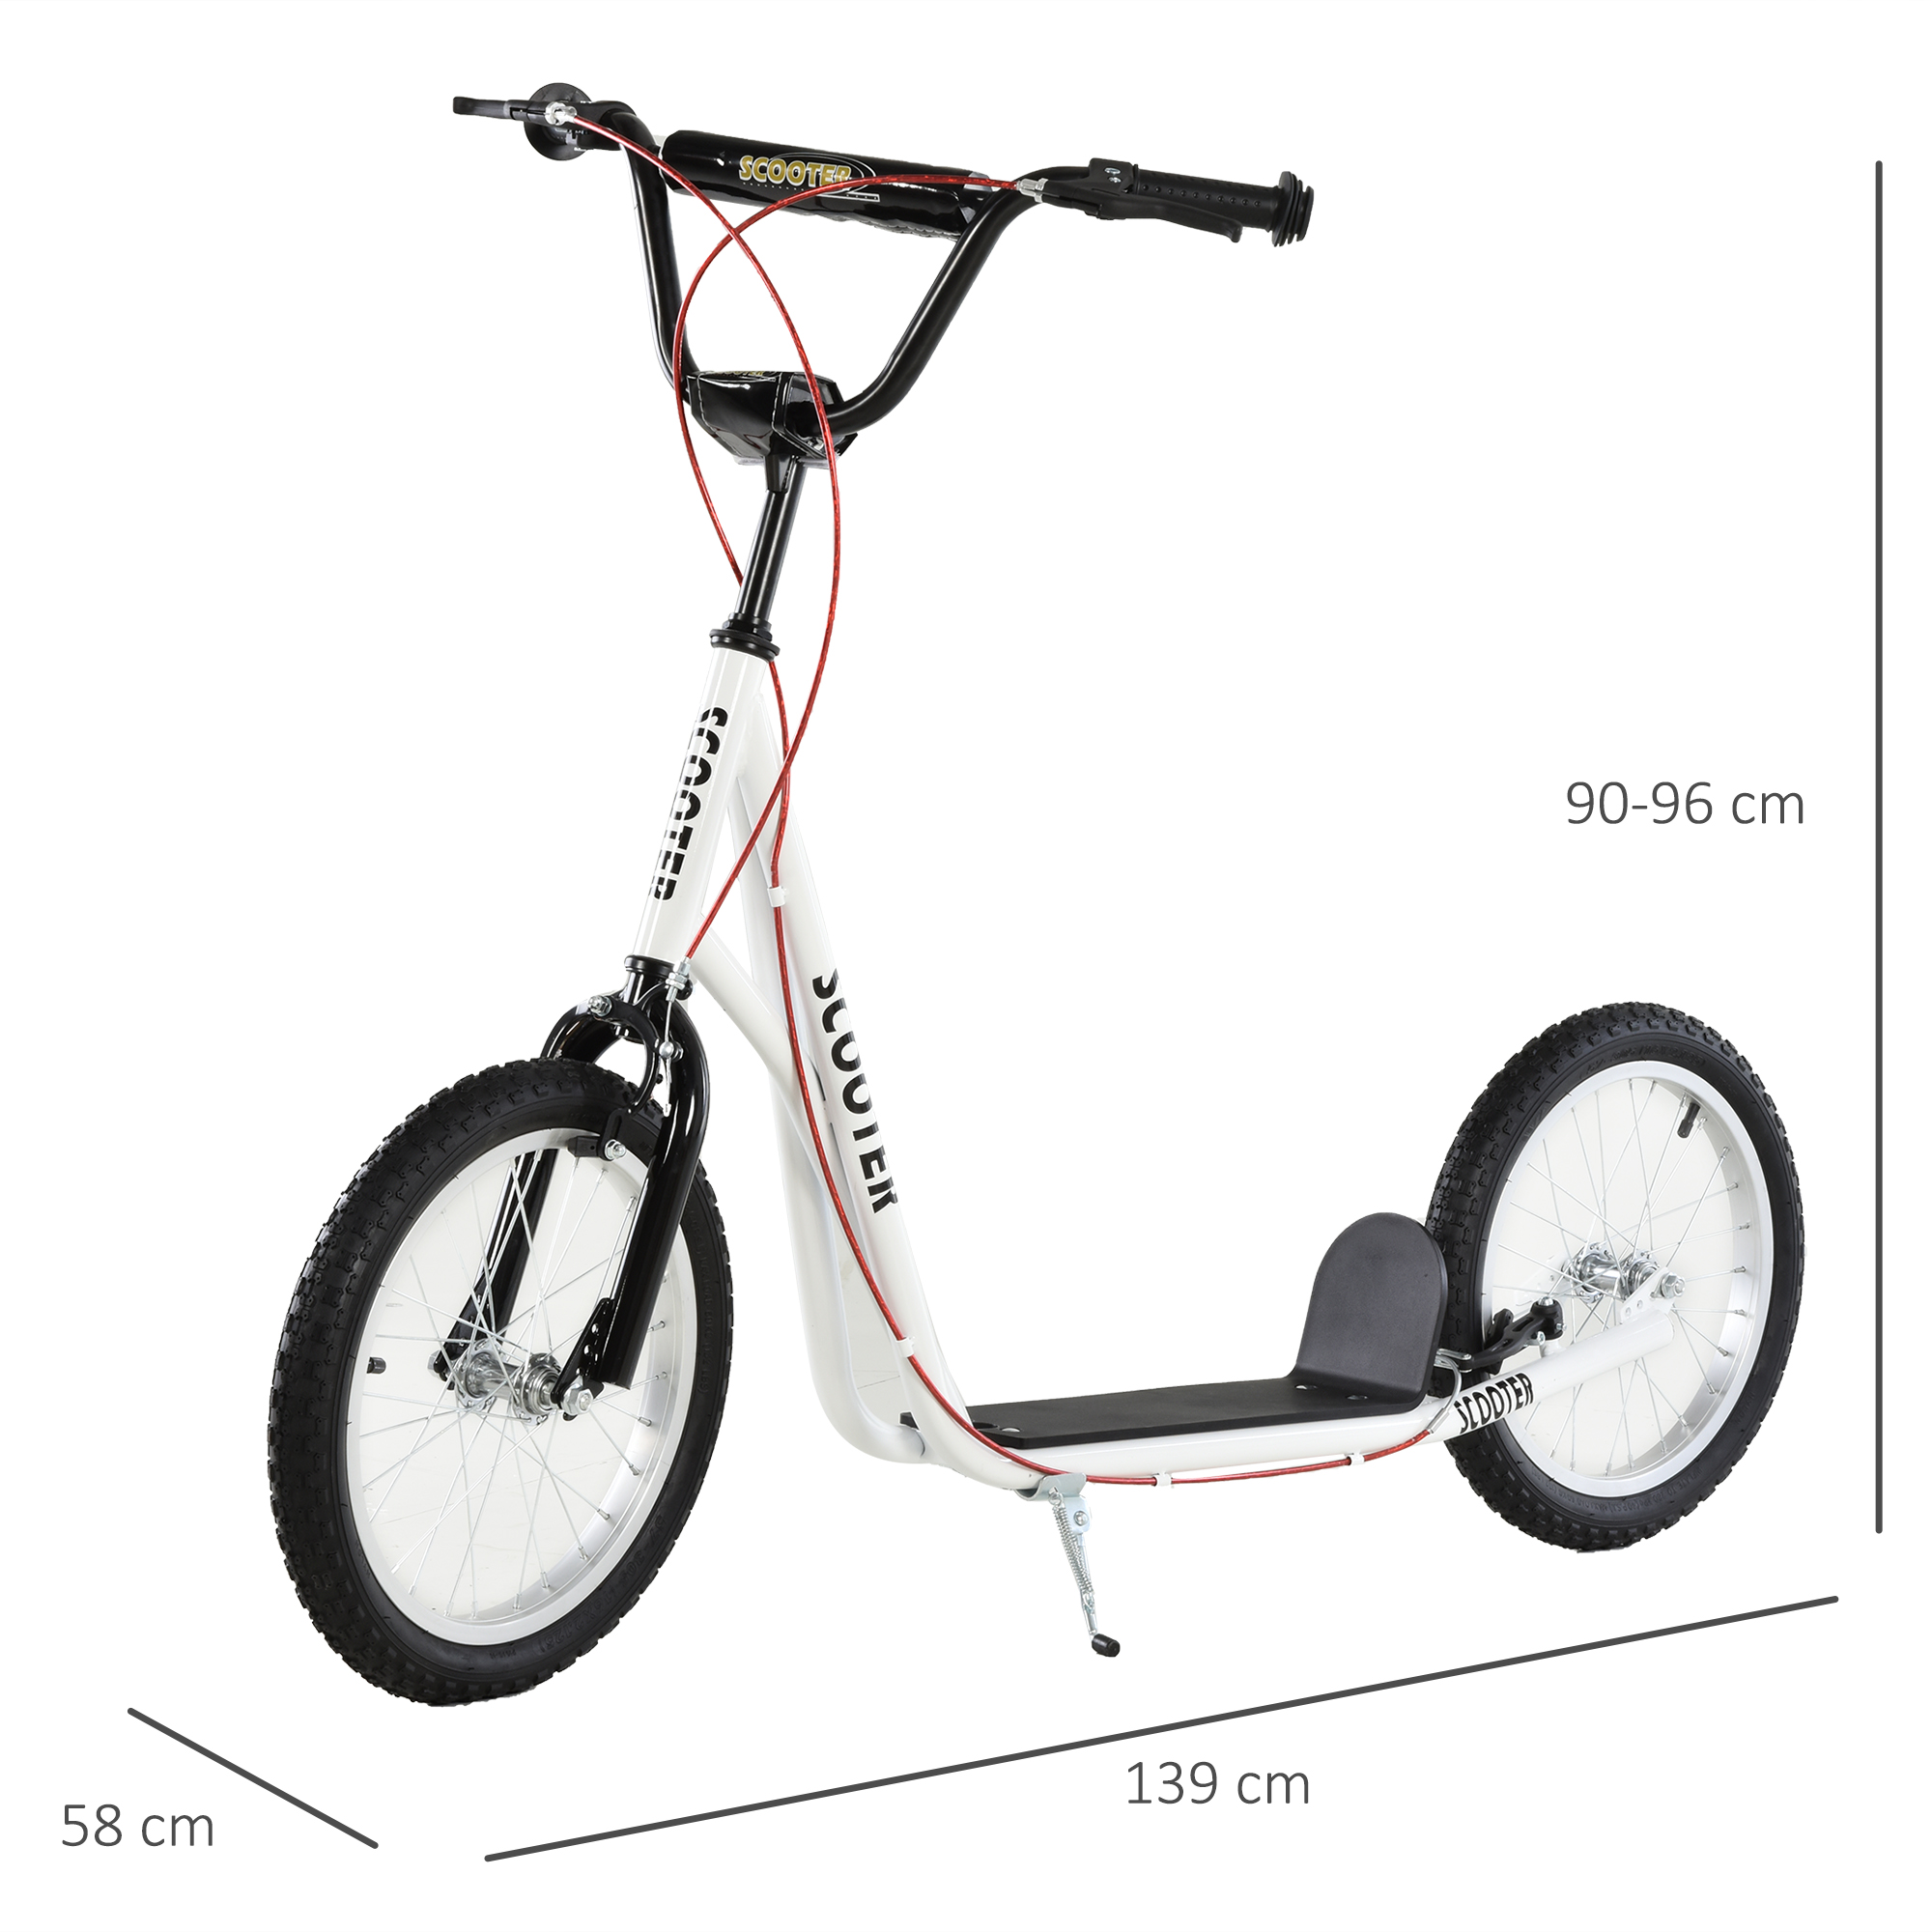 Indexbild 45 - HOMCOM-Tretroller-Kinderroller-Scooter-Cityroller-Roller-verstellbar-Blau-Gruen